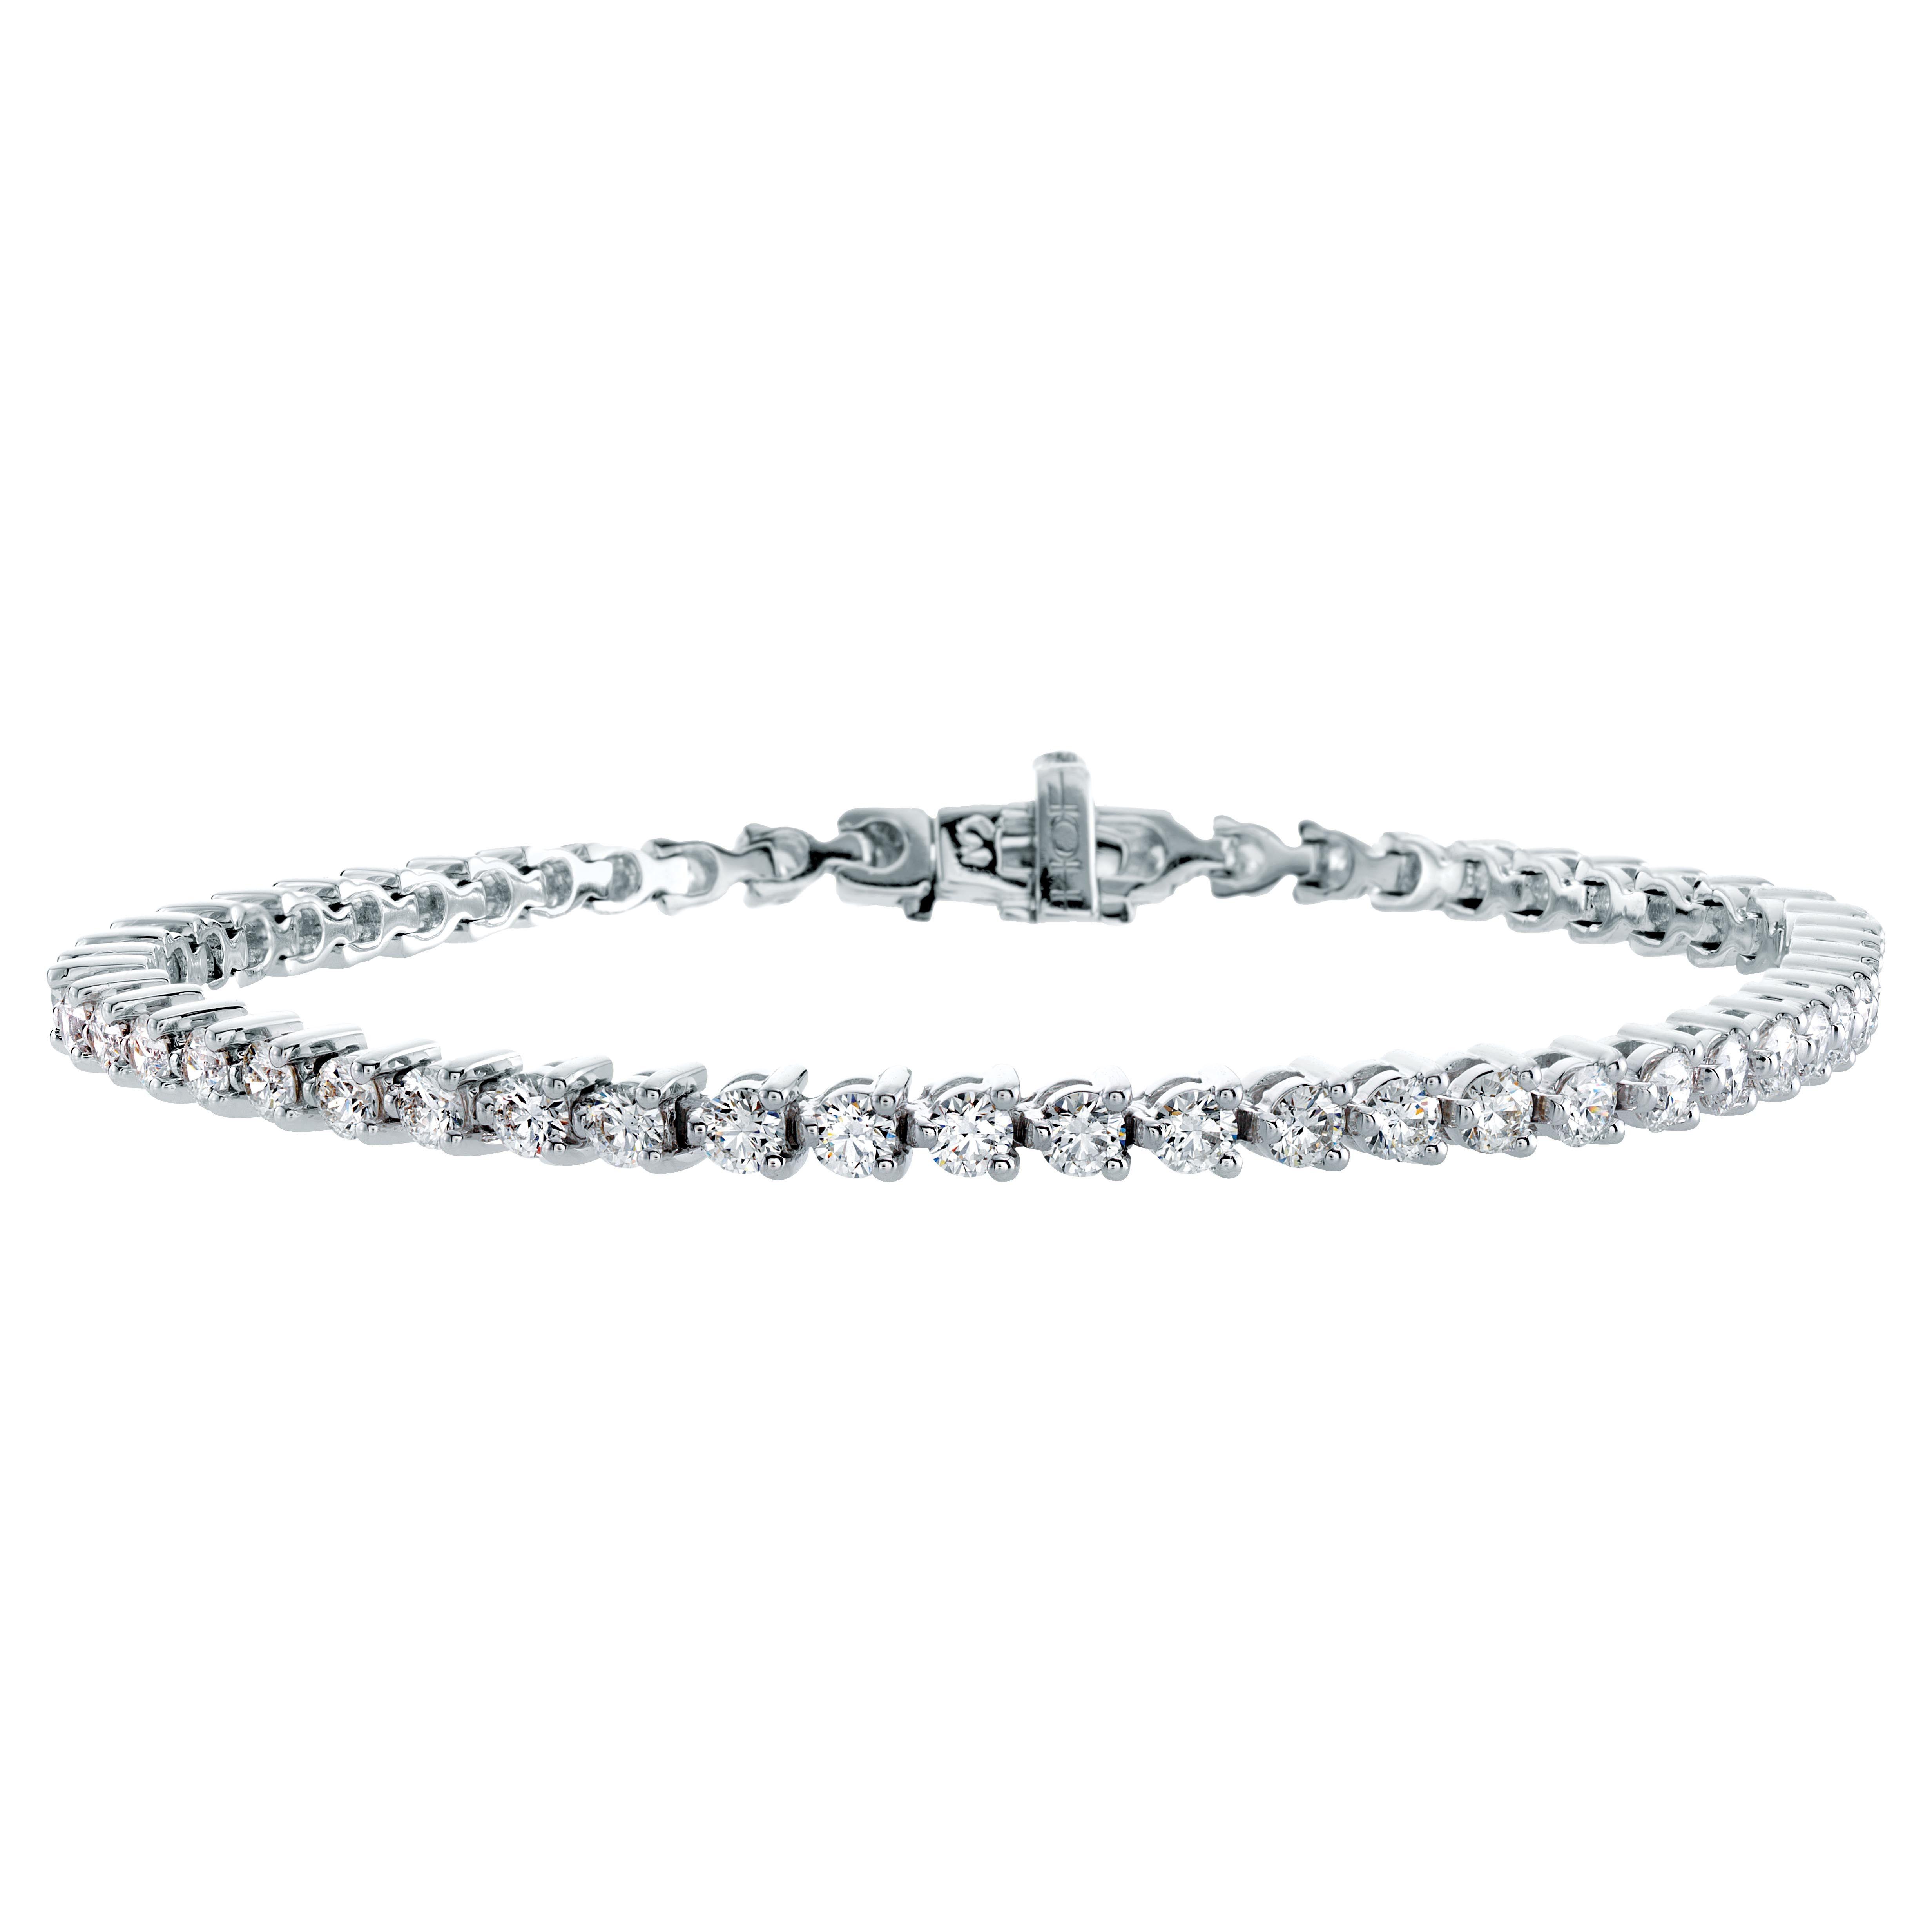 New Hearts On Fire 3 17 Ctw Diamond Select Temptation Tennis Bracelet